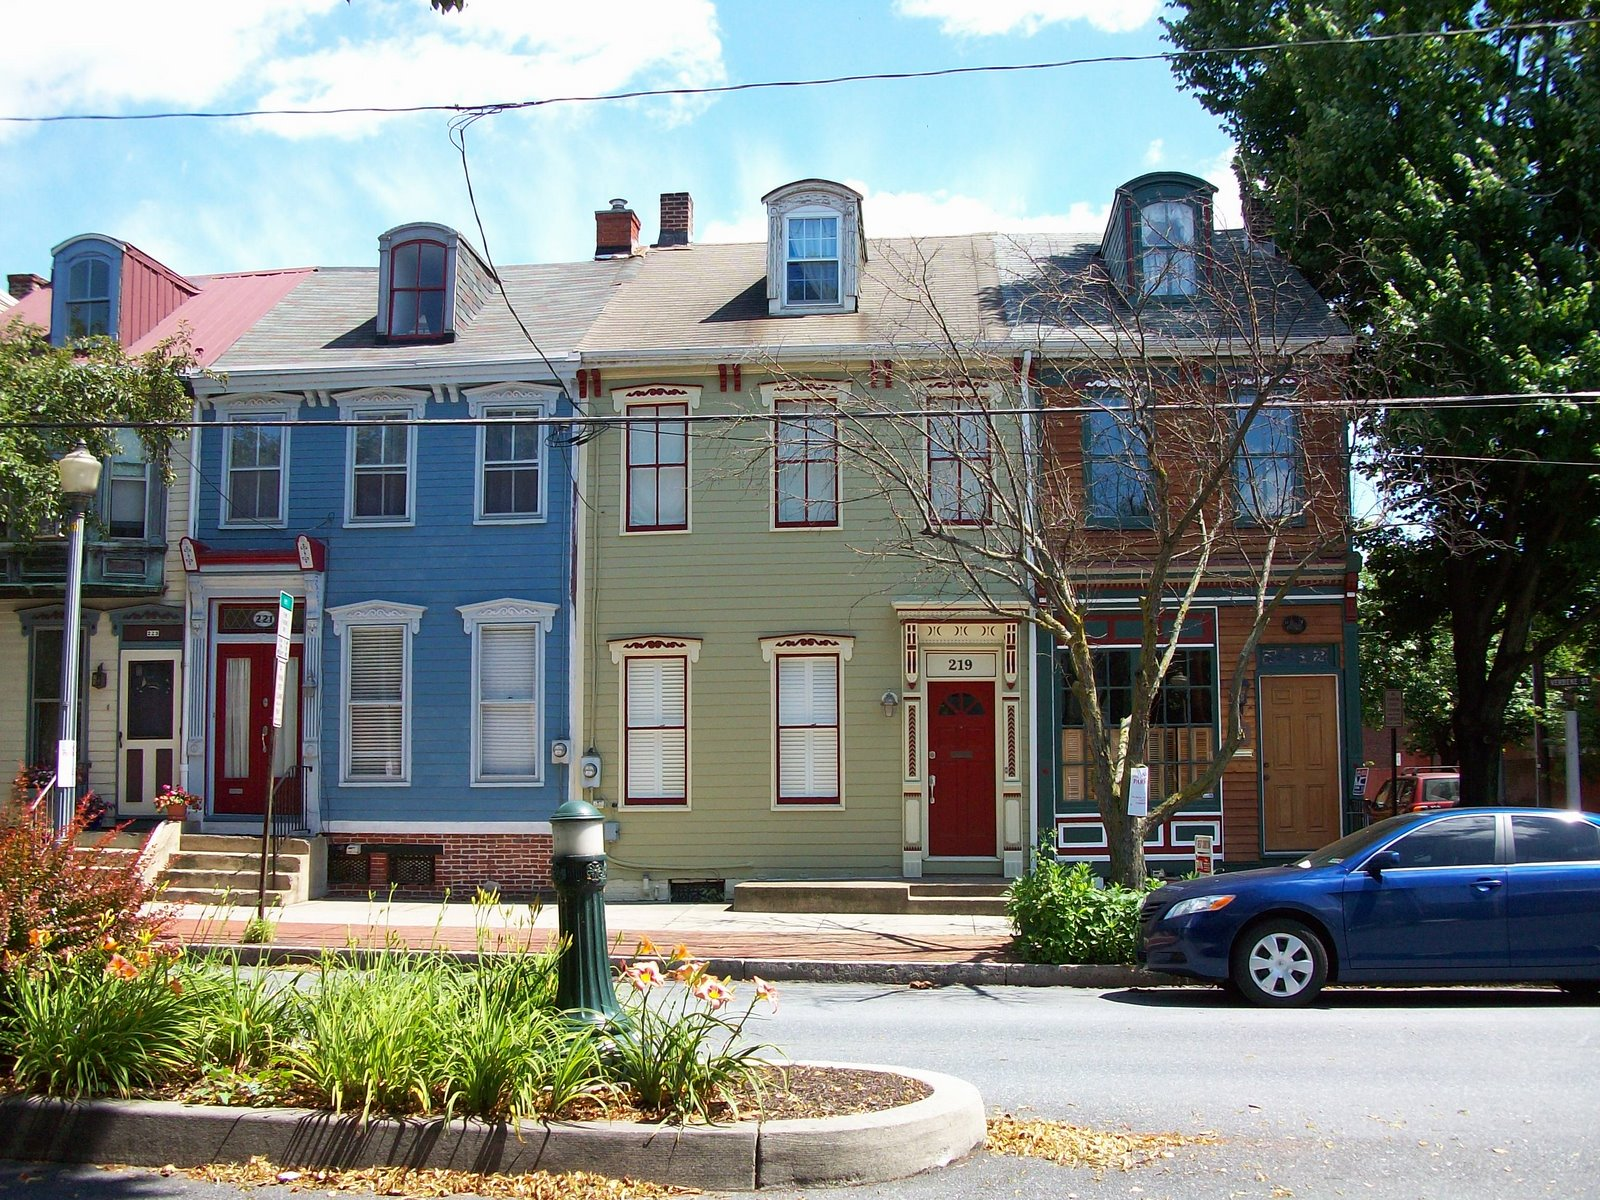 House Flipping - BEFORE - Restoration Easy Money! Part 1 ...